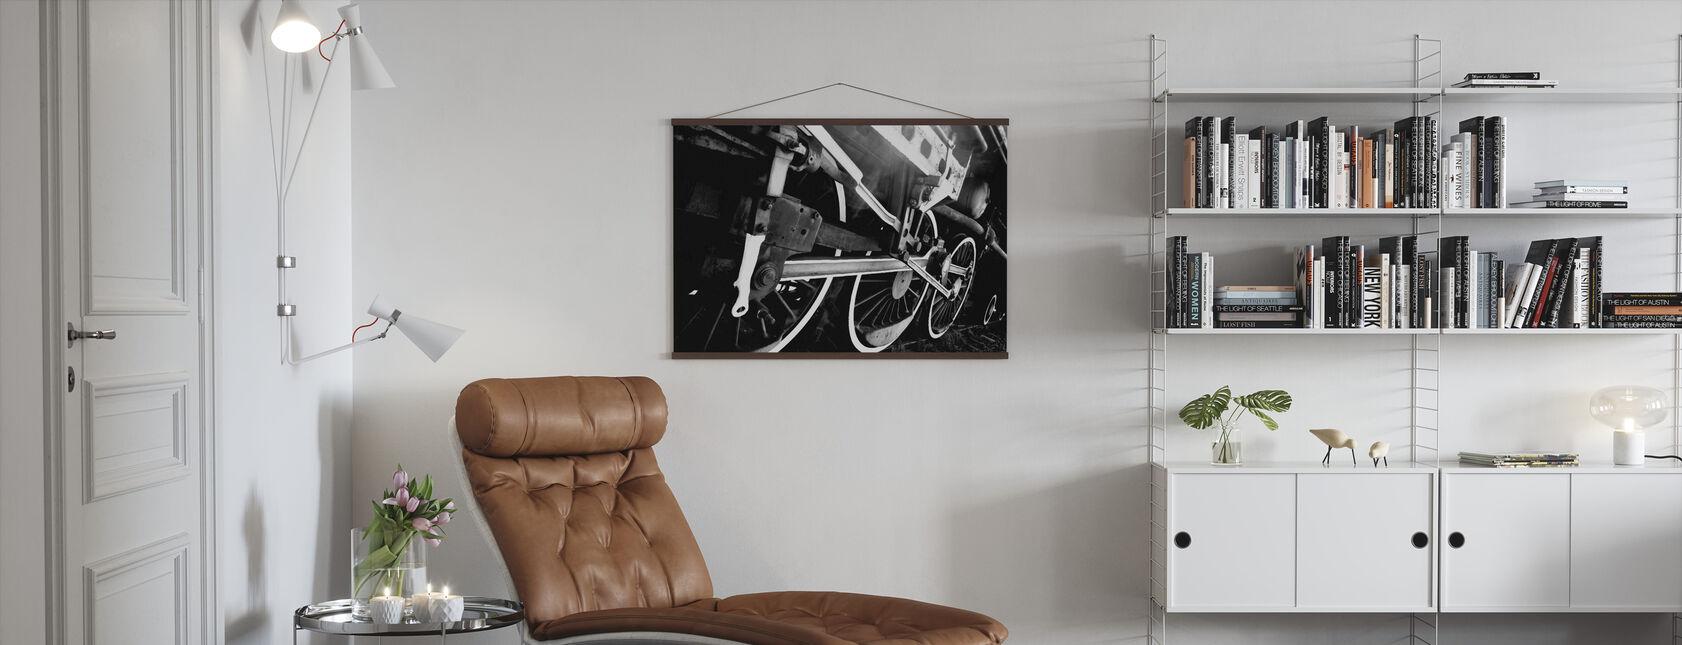 Locomotive - Poster - Living Room